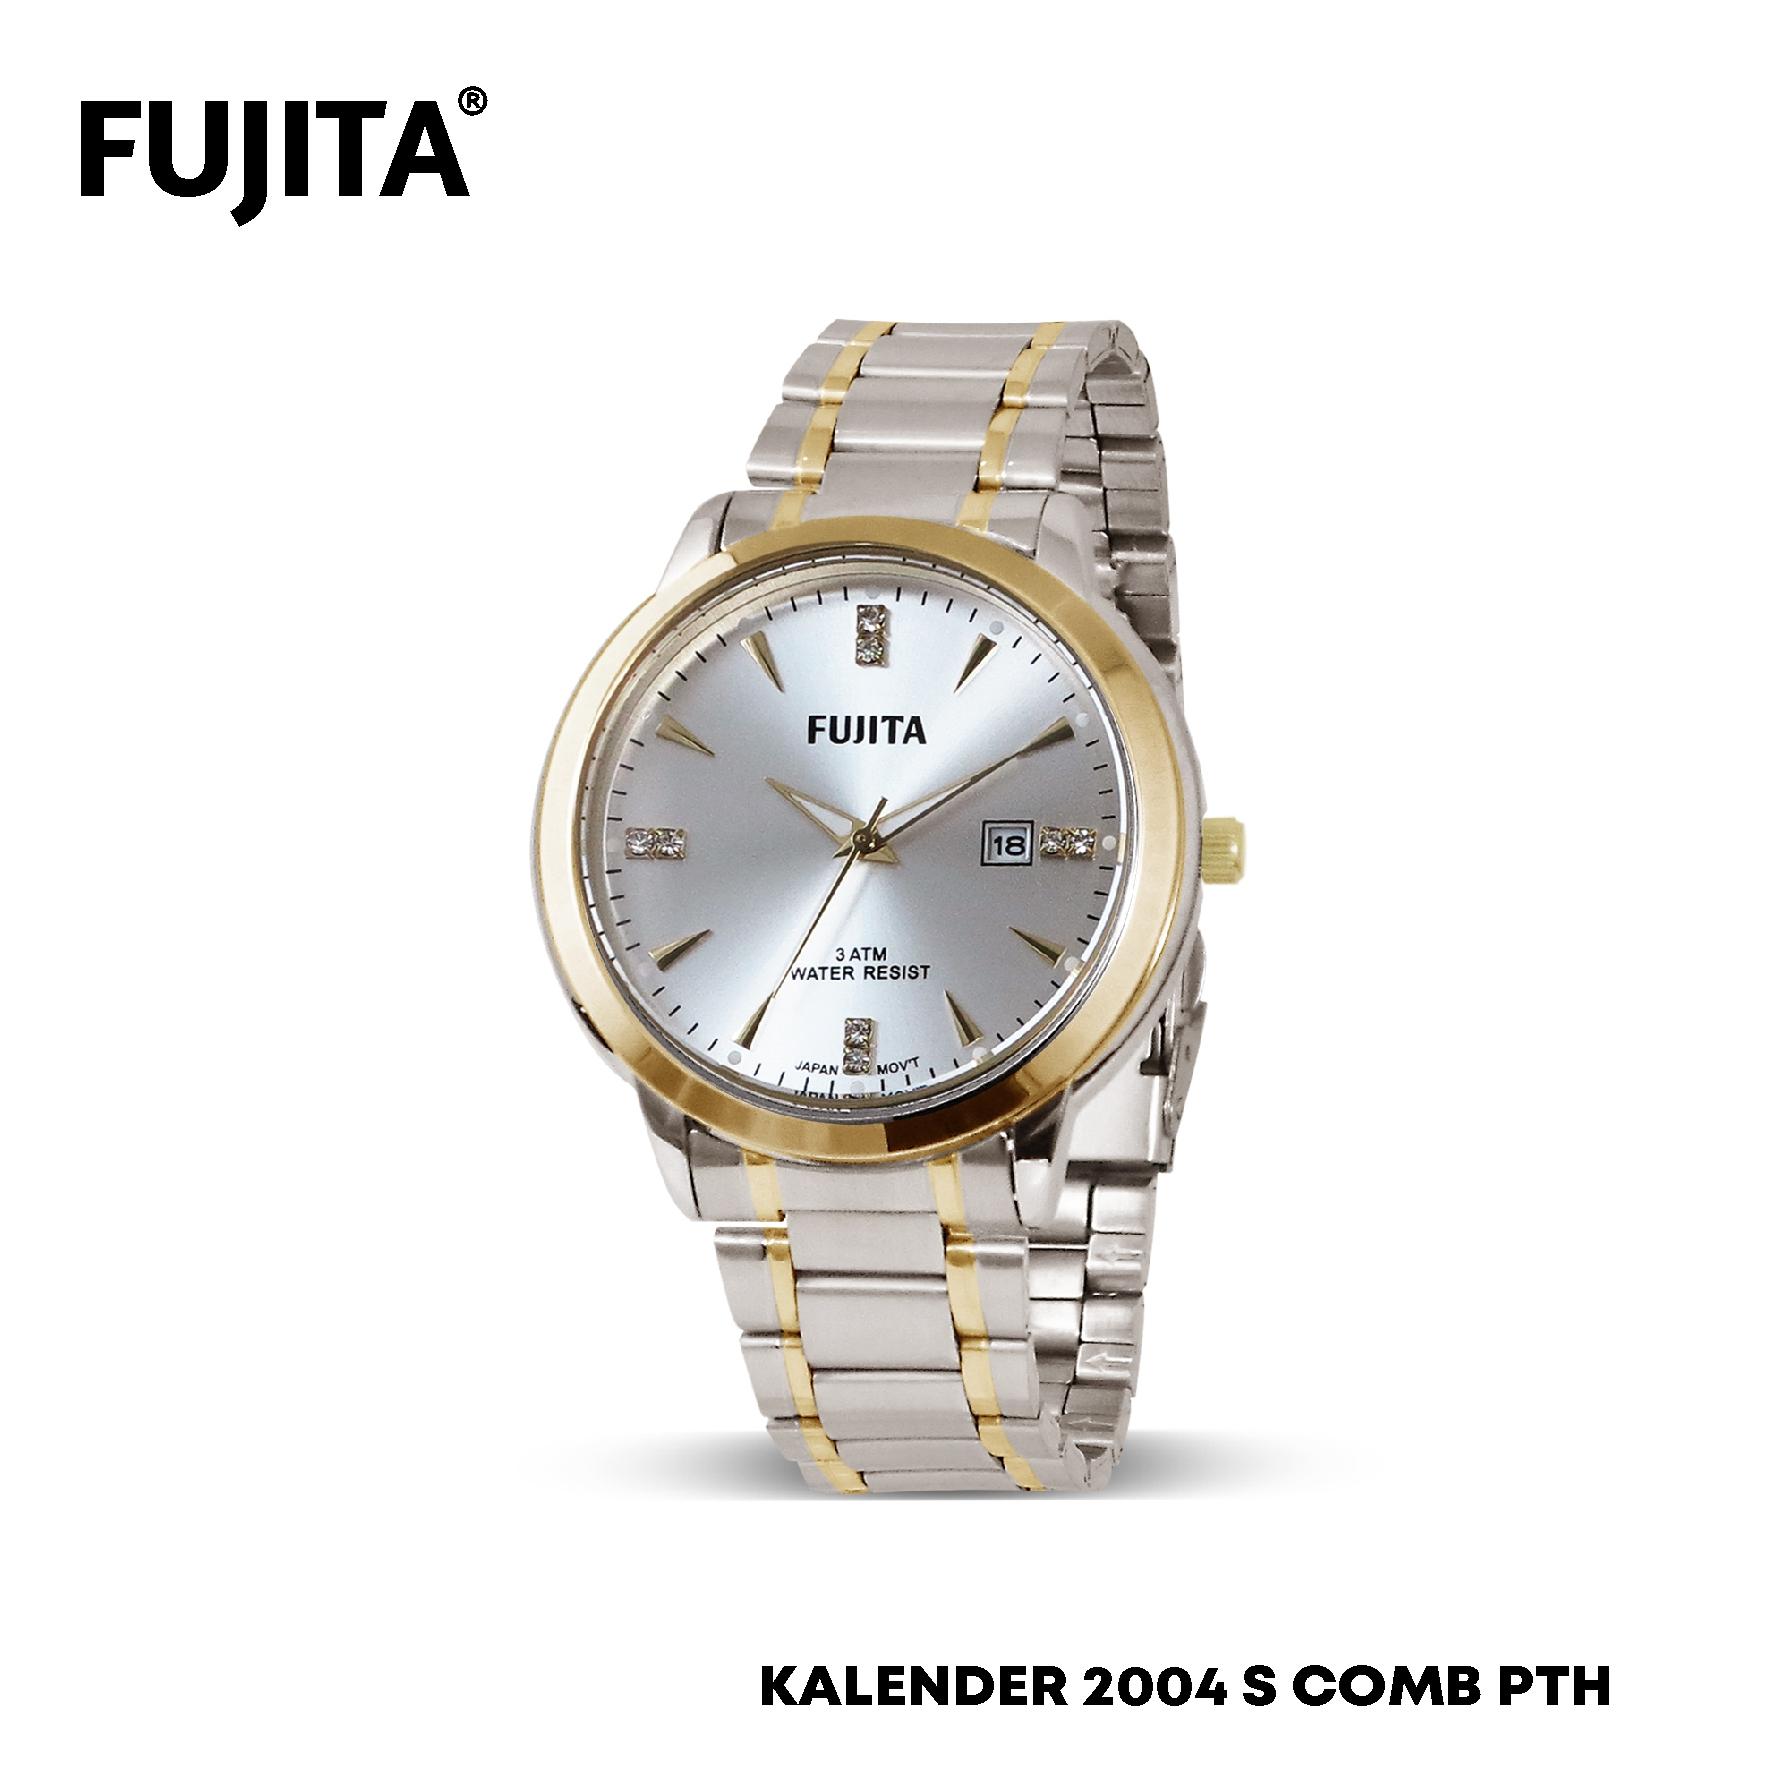 FUJITA series 2004 S ( Kalender )